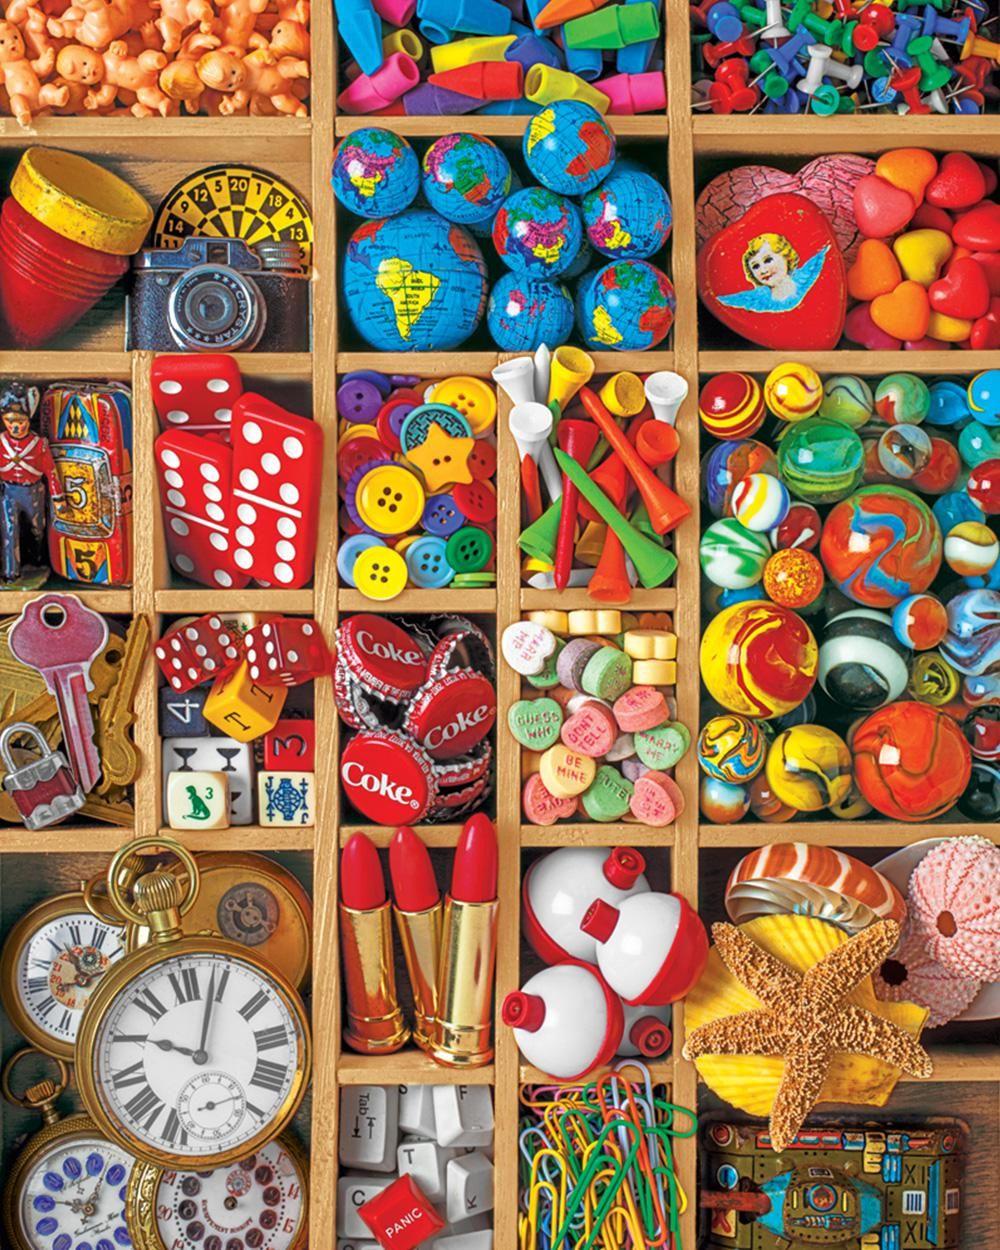 Tiny Treasures Is One Of Springbok's 2000 Piece Jigsaw